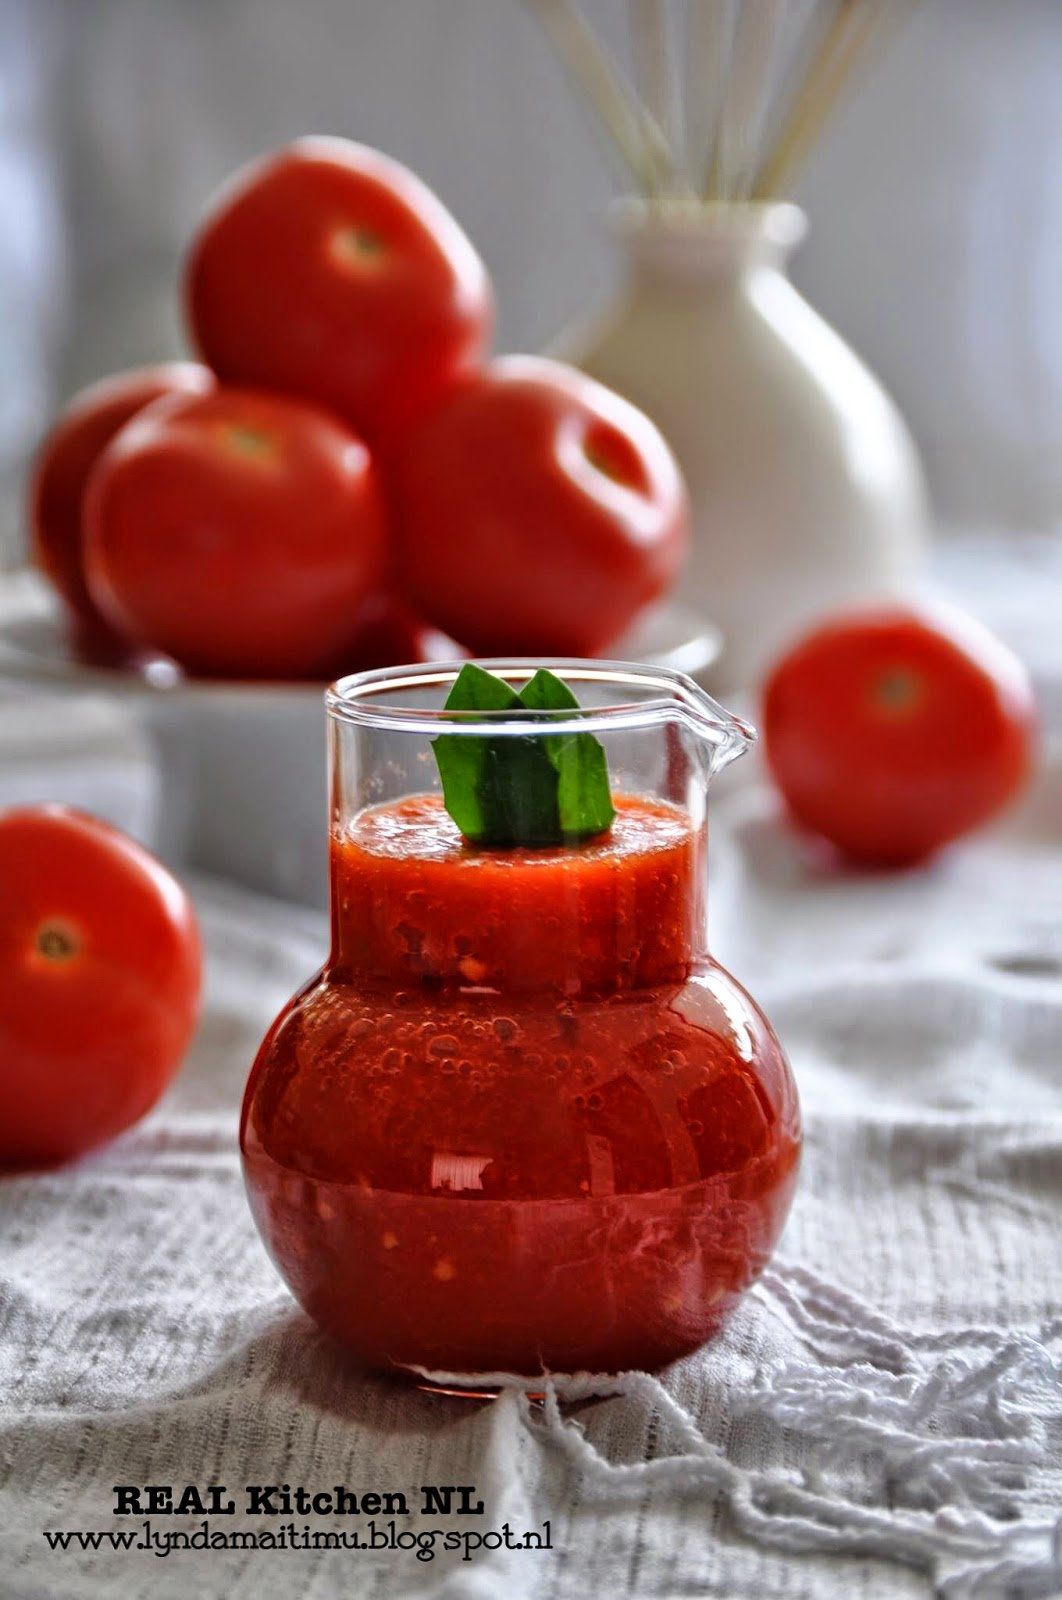 Cara Membuat Saus Tomat : membuat, tomat, REALKitchen24:, Homemade, Tomato, Sauce